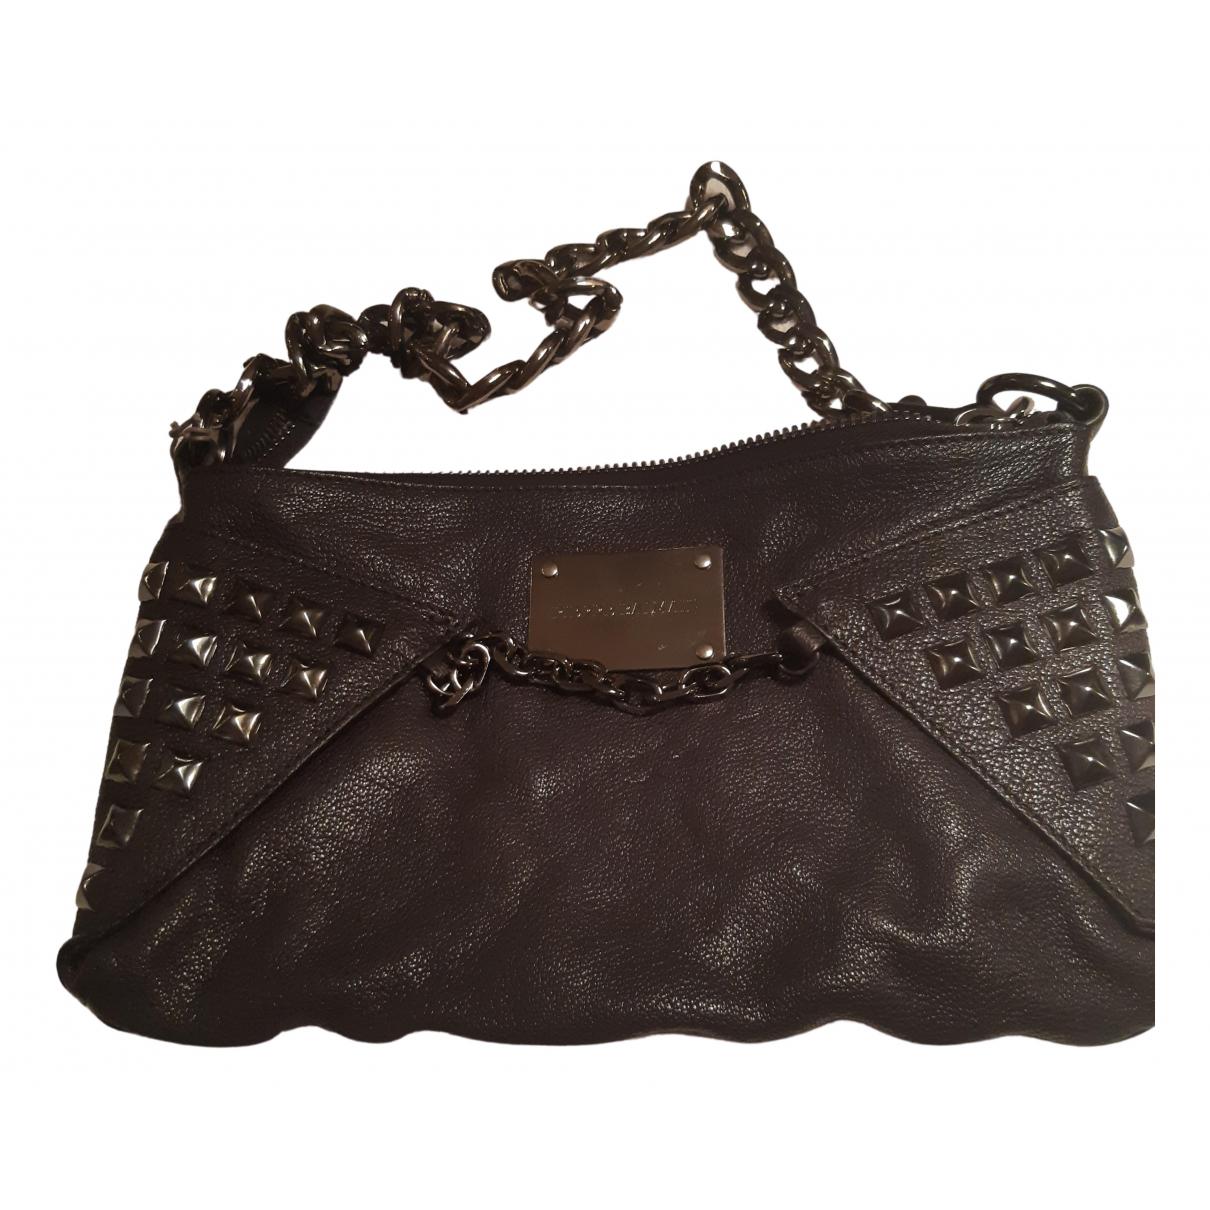 Balmain \N Black Leather handbag for Women \N